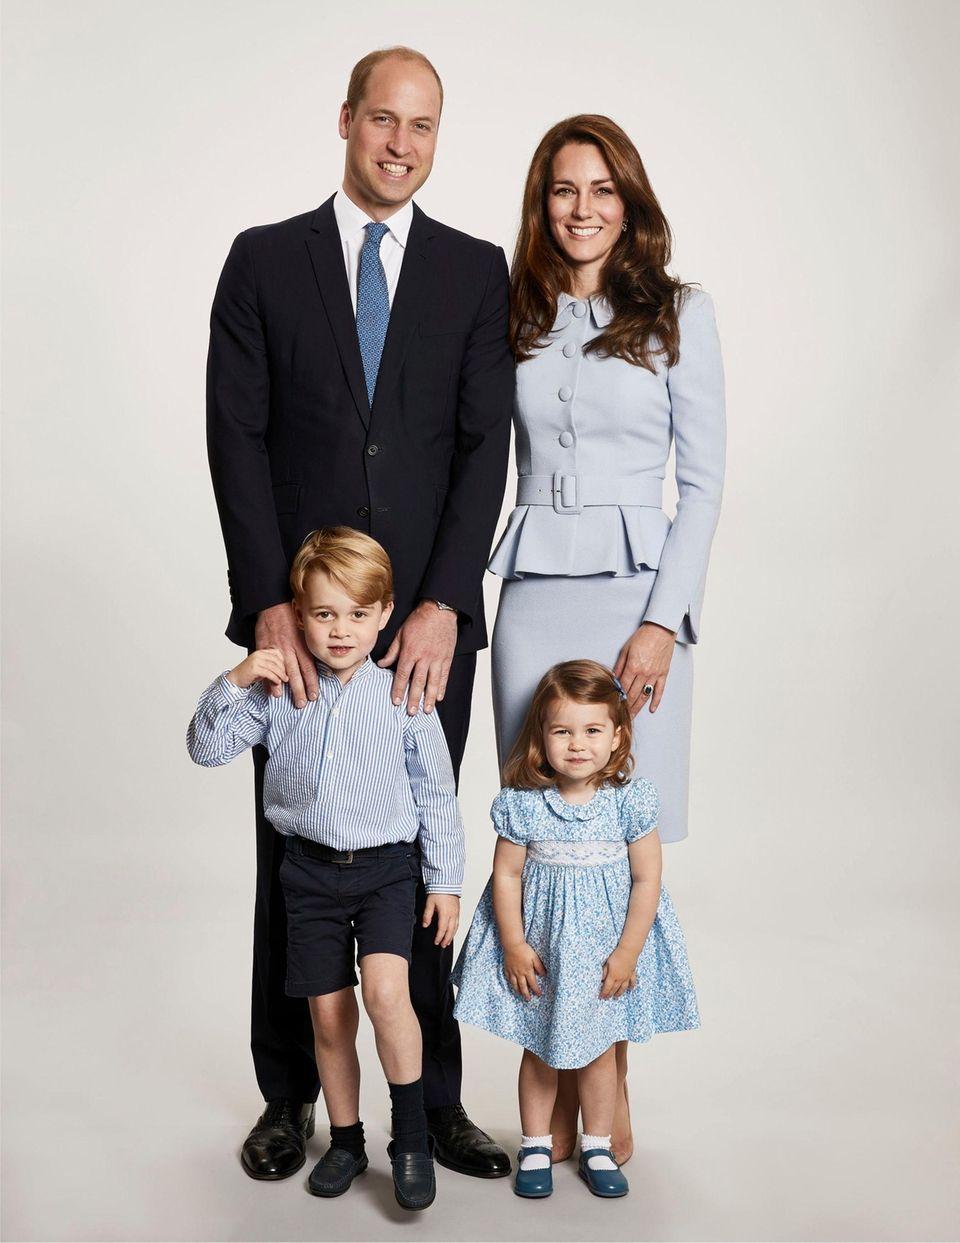 Prince William, Kate Middleton, Prince George and Princess